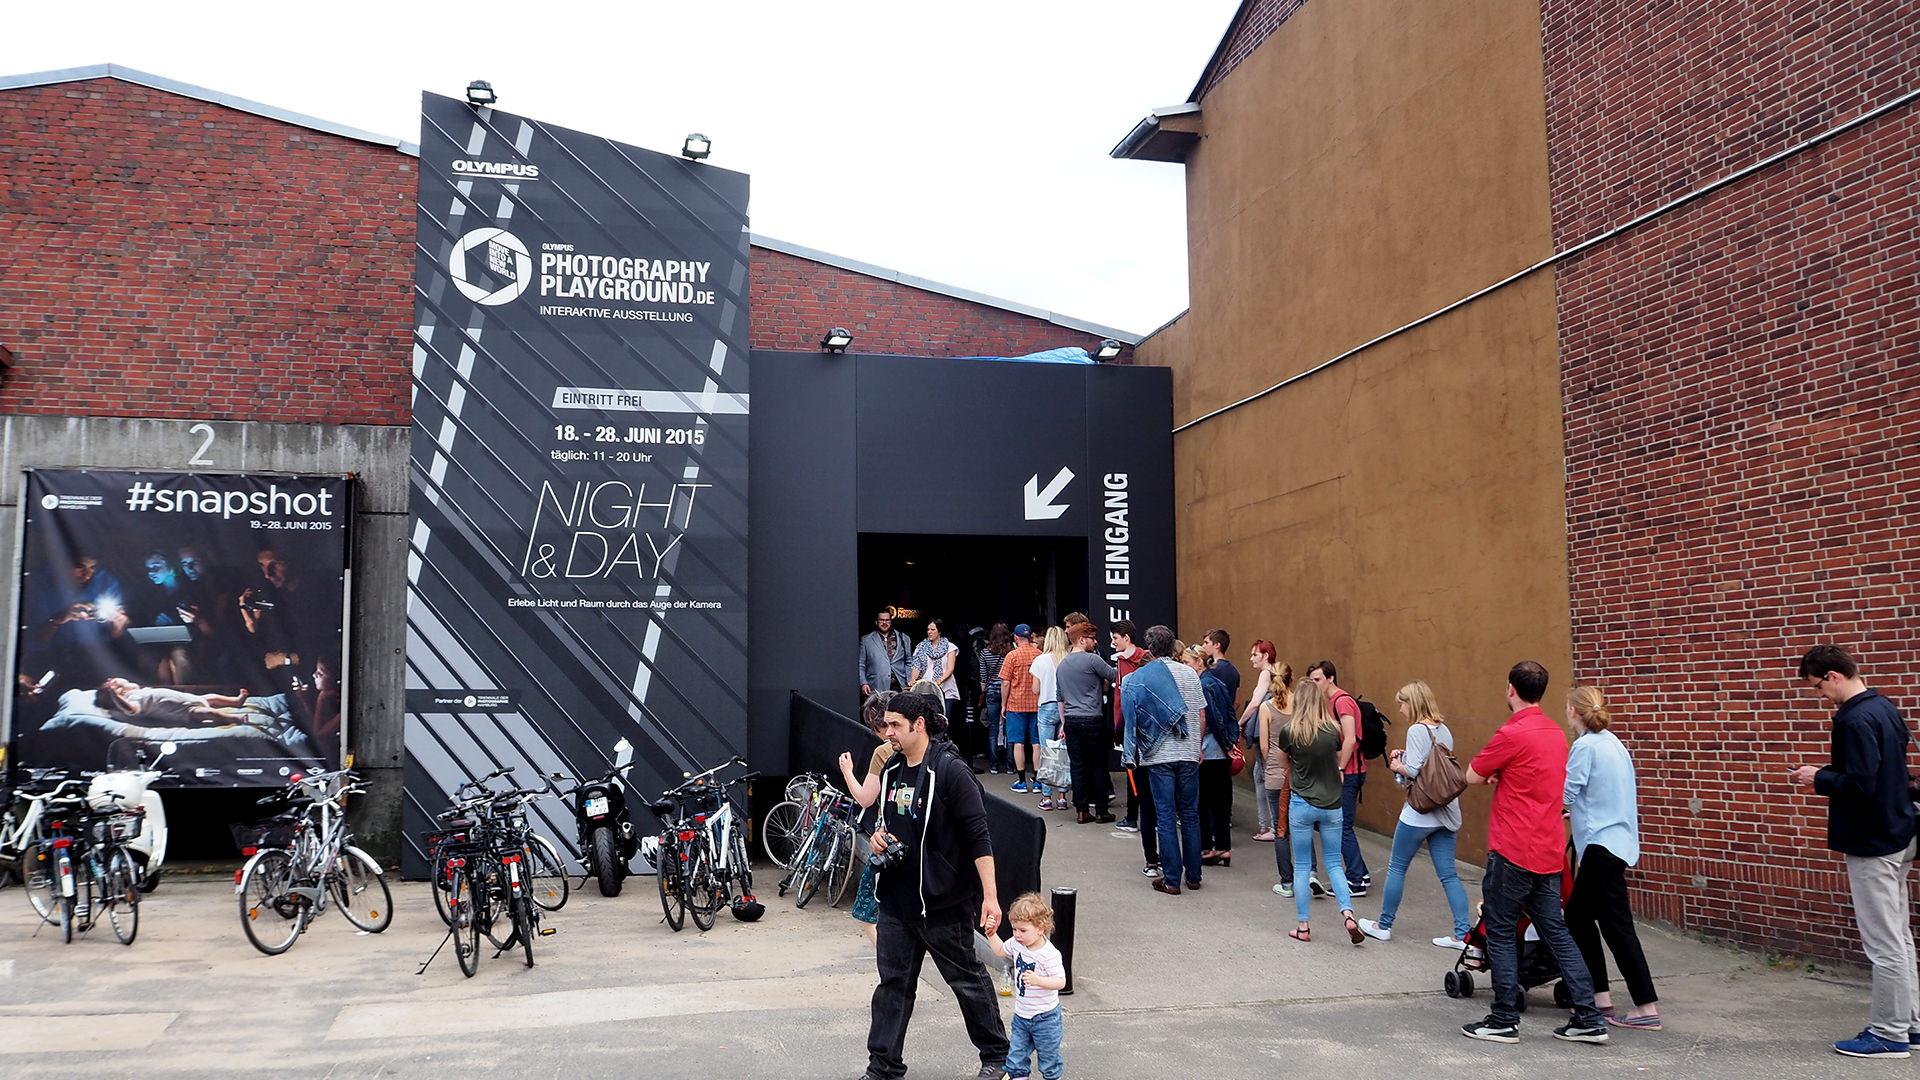 Messe Design Live Kommunikation Hamburg Berlin Köln Olympus Photography Playground Fassade Eingang Gäste Going Places EventLabs